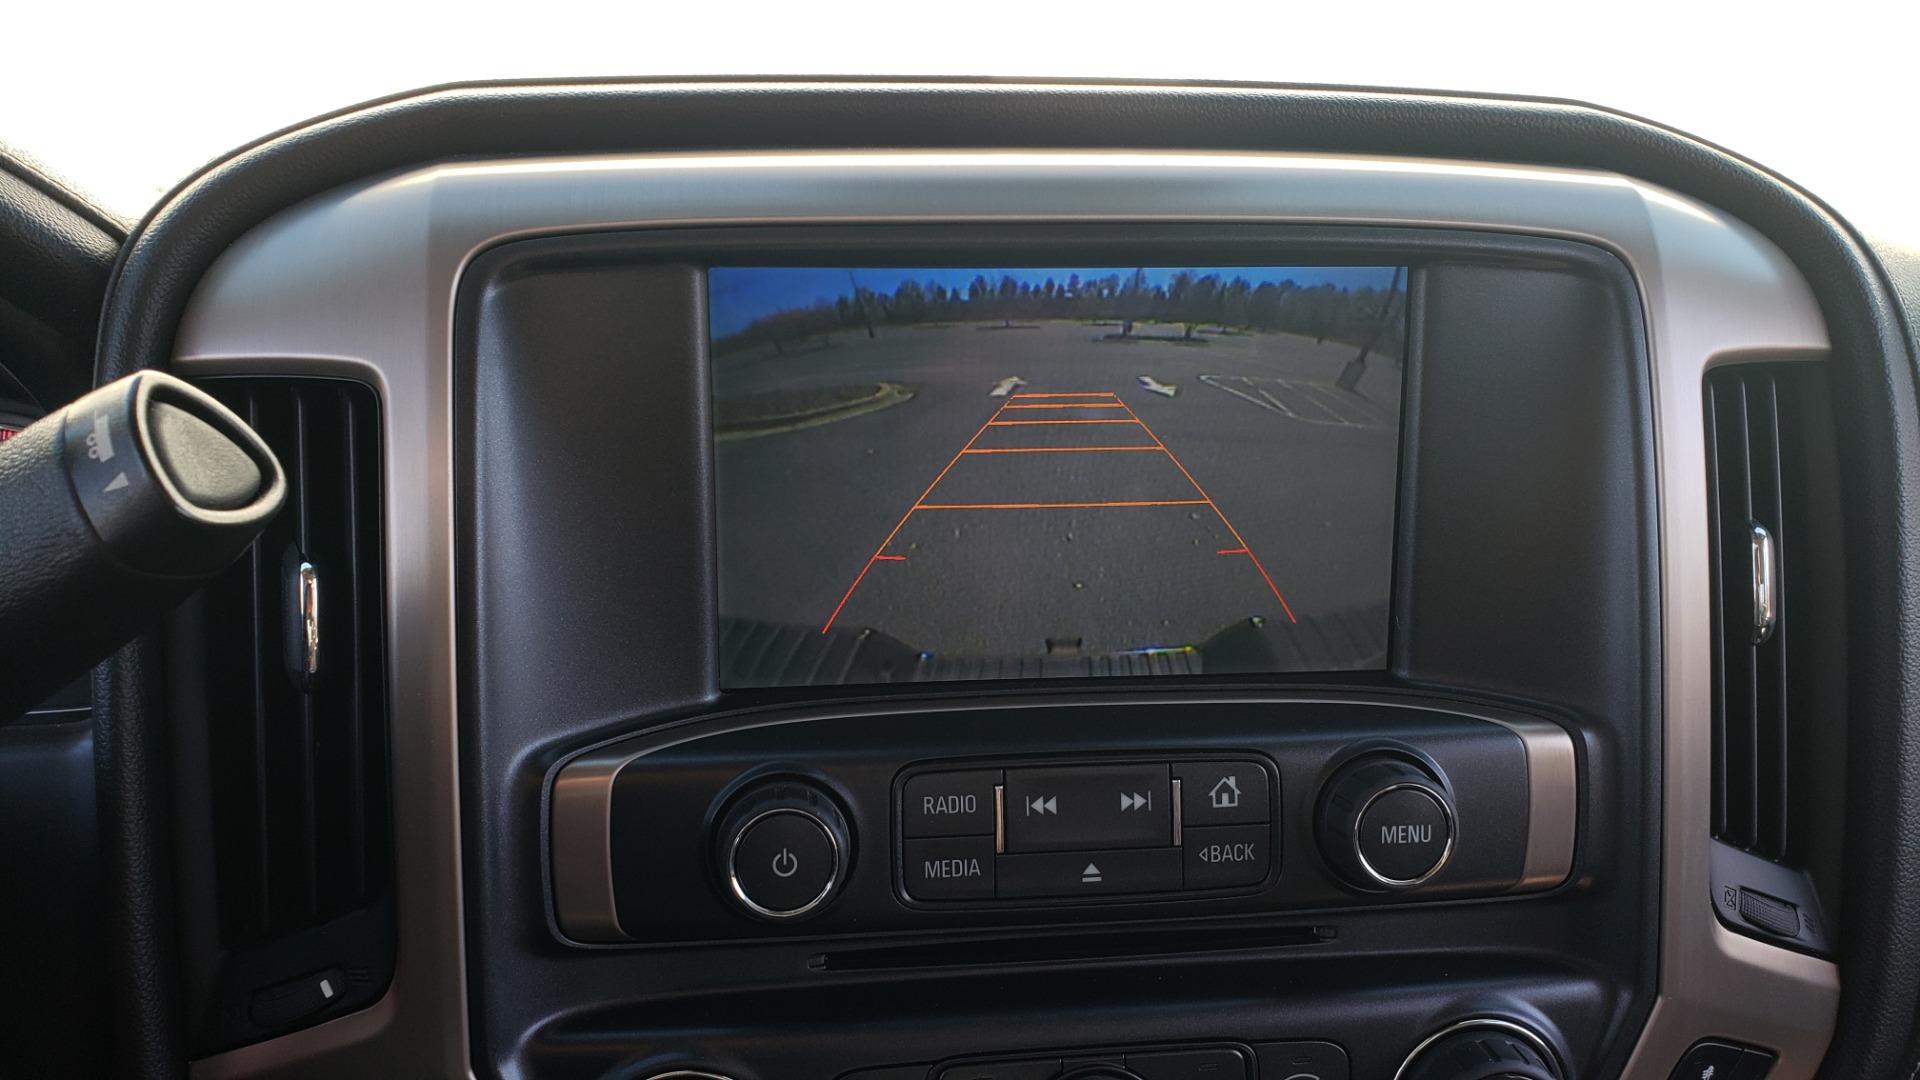 Used 2015 GMC SIERRA 2500HD DENALI 4WD CREWCAB / 6.6L DURAMAX / 6-SPD AUTO / NAV / BOSE for sale $50,995 at Formula Imports in Charlotte NC 28227 54